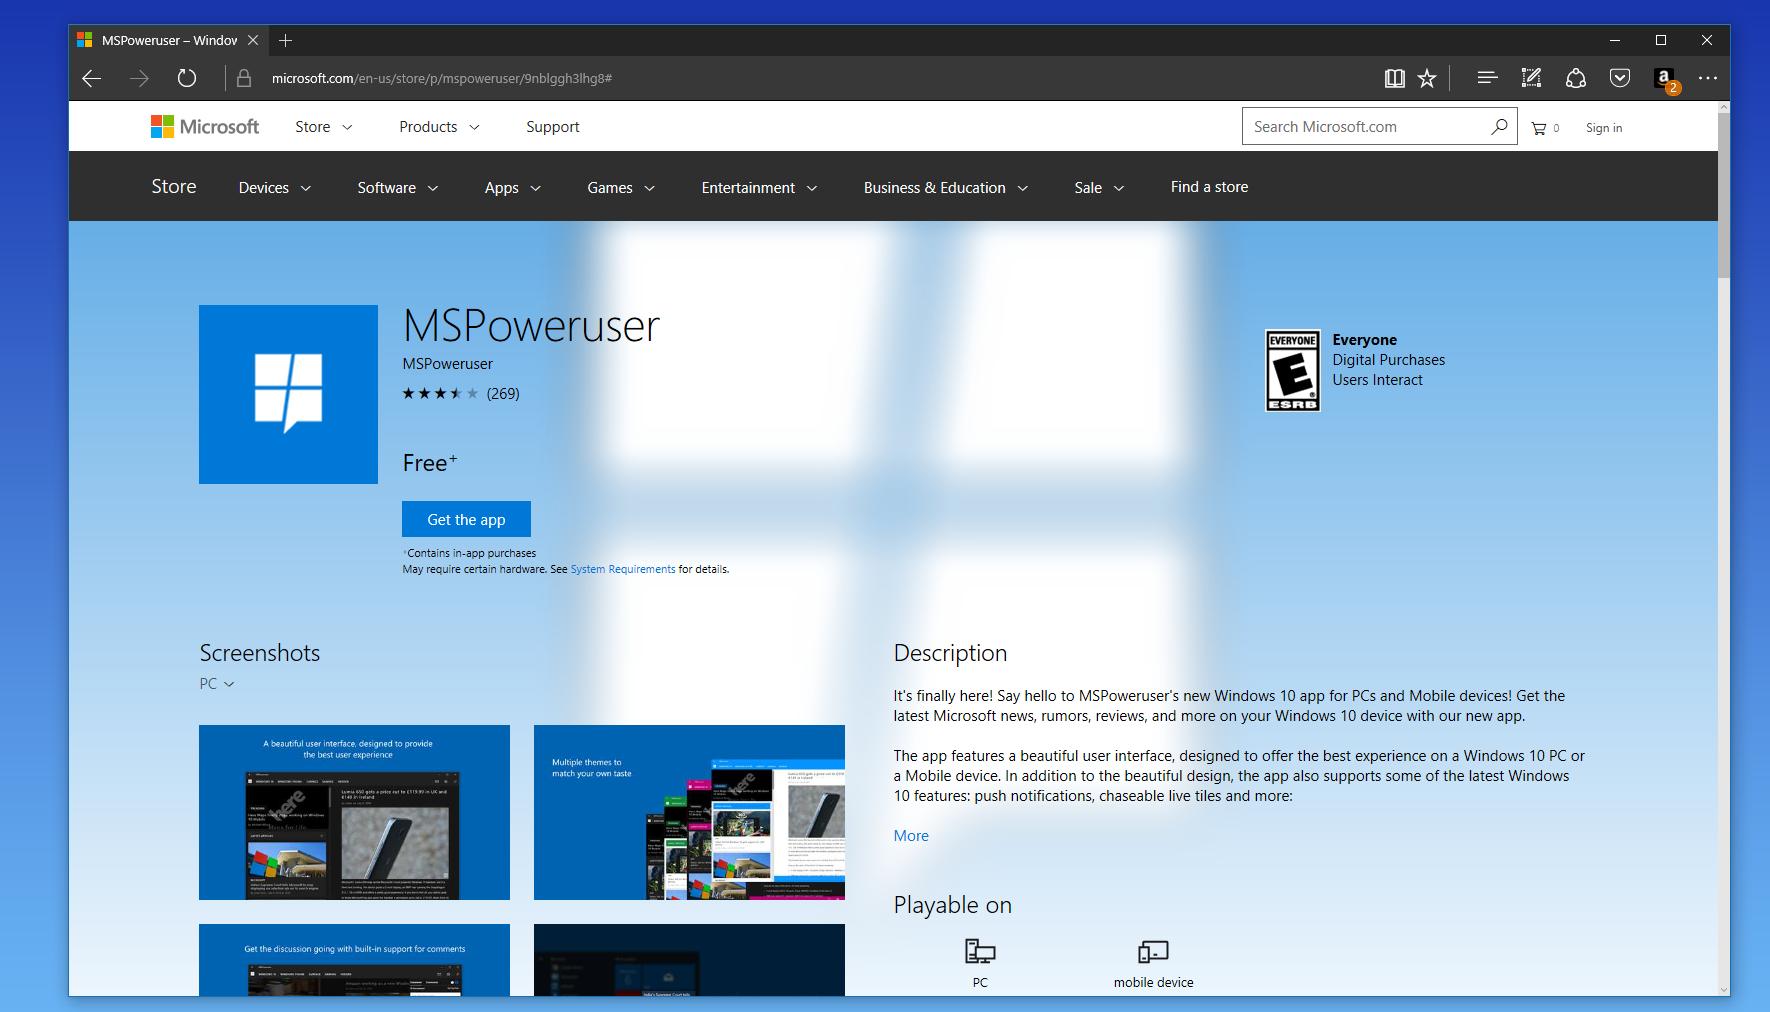 Windows Store gets a new design on the web - MSPoweruser